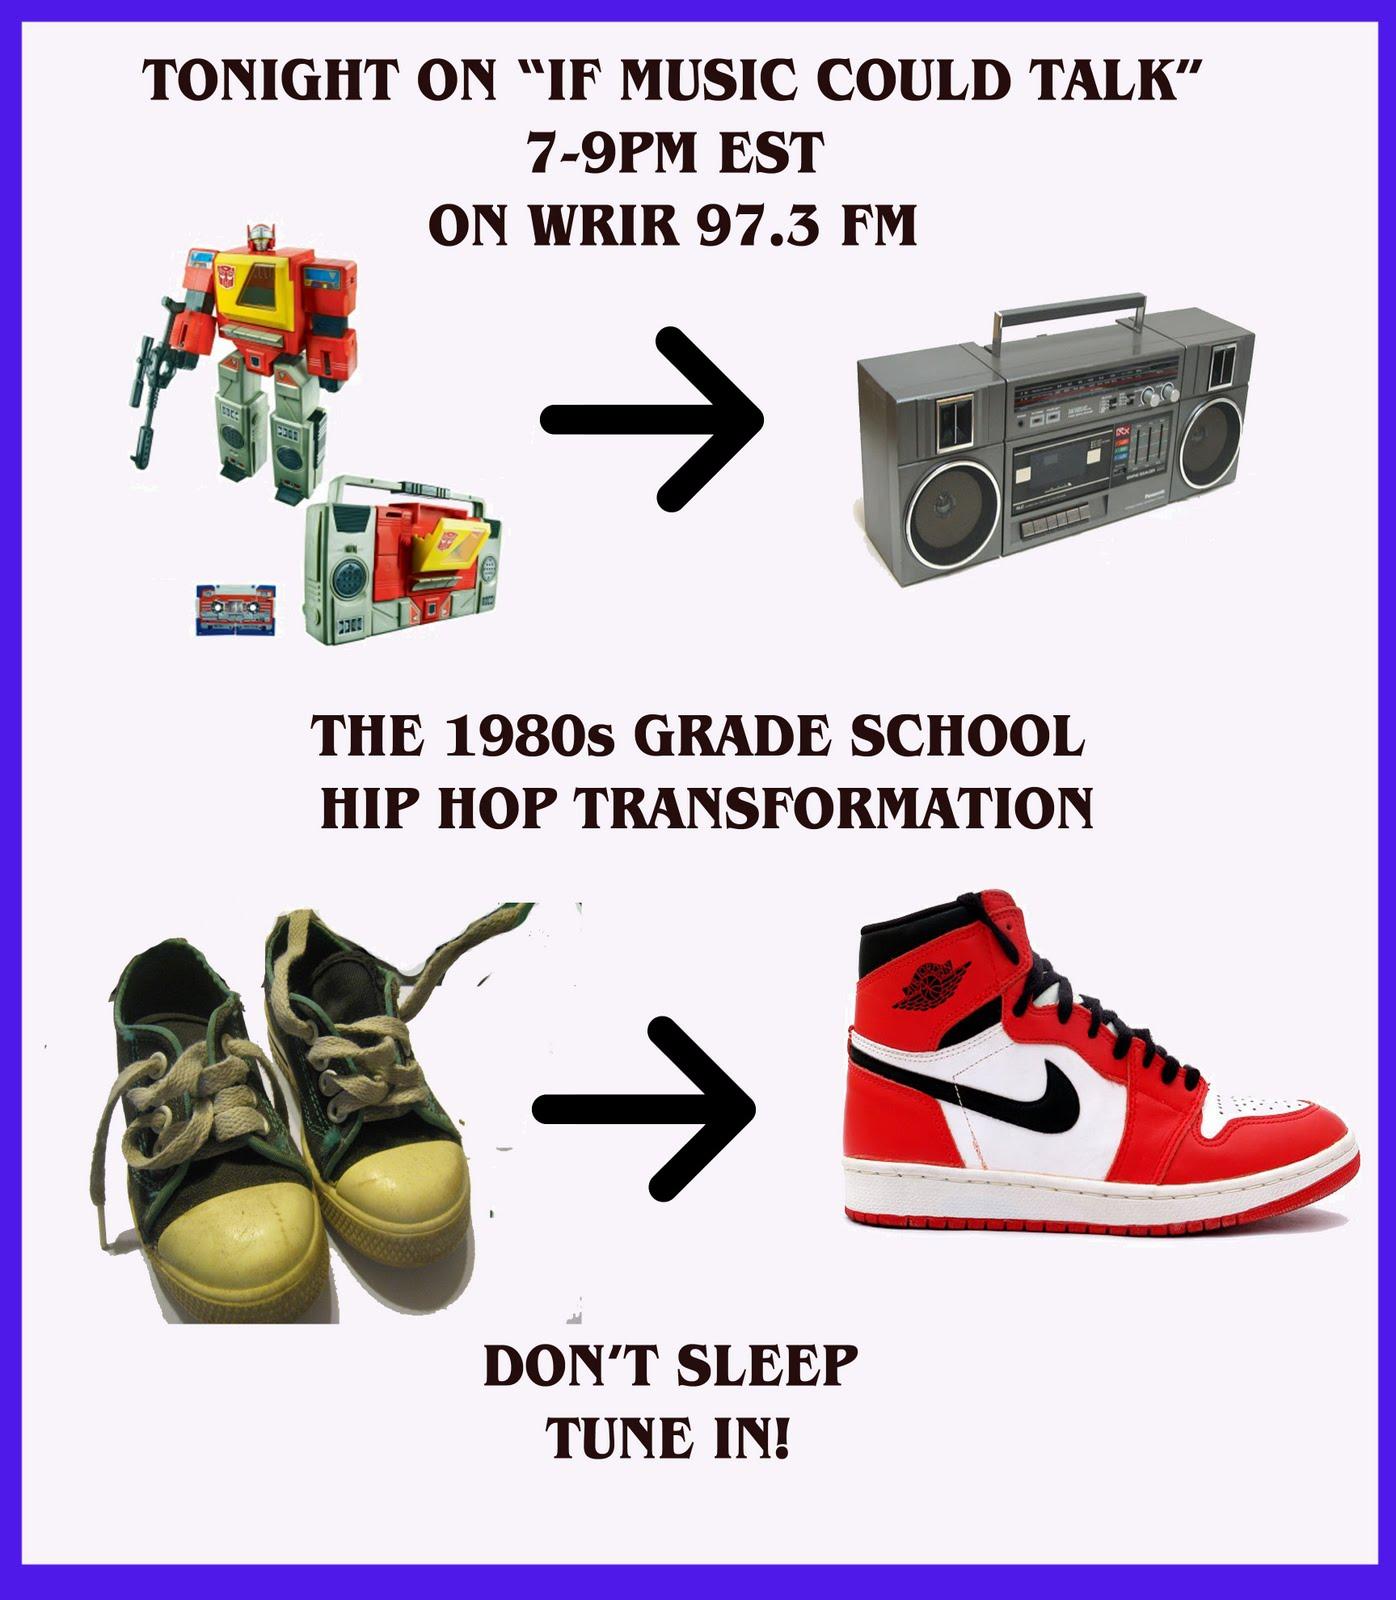 If music could talk nov 20 2011 old school hip hop